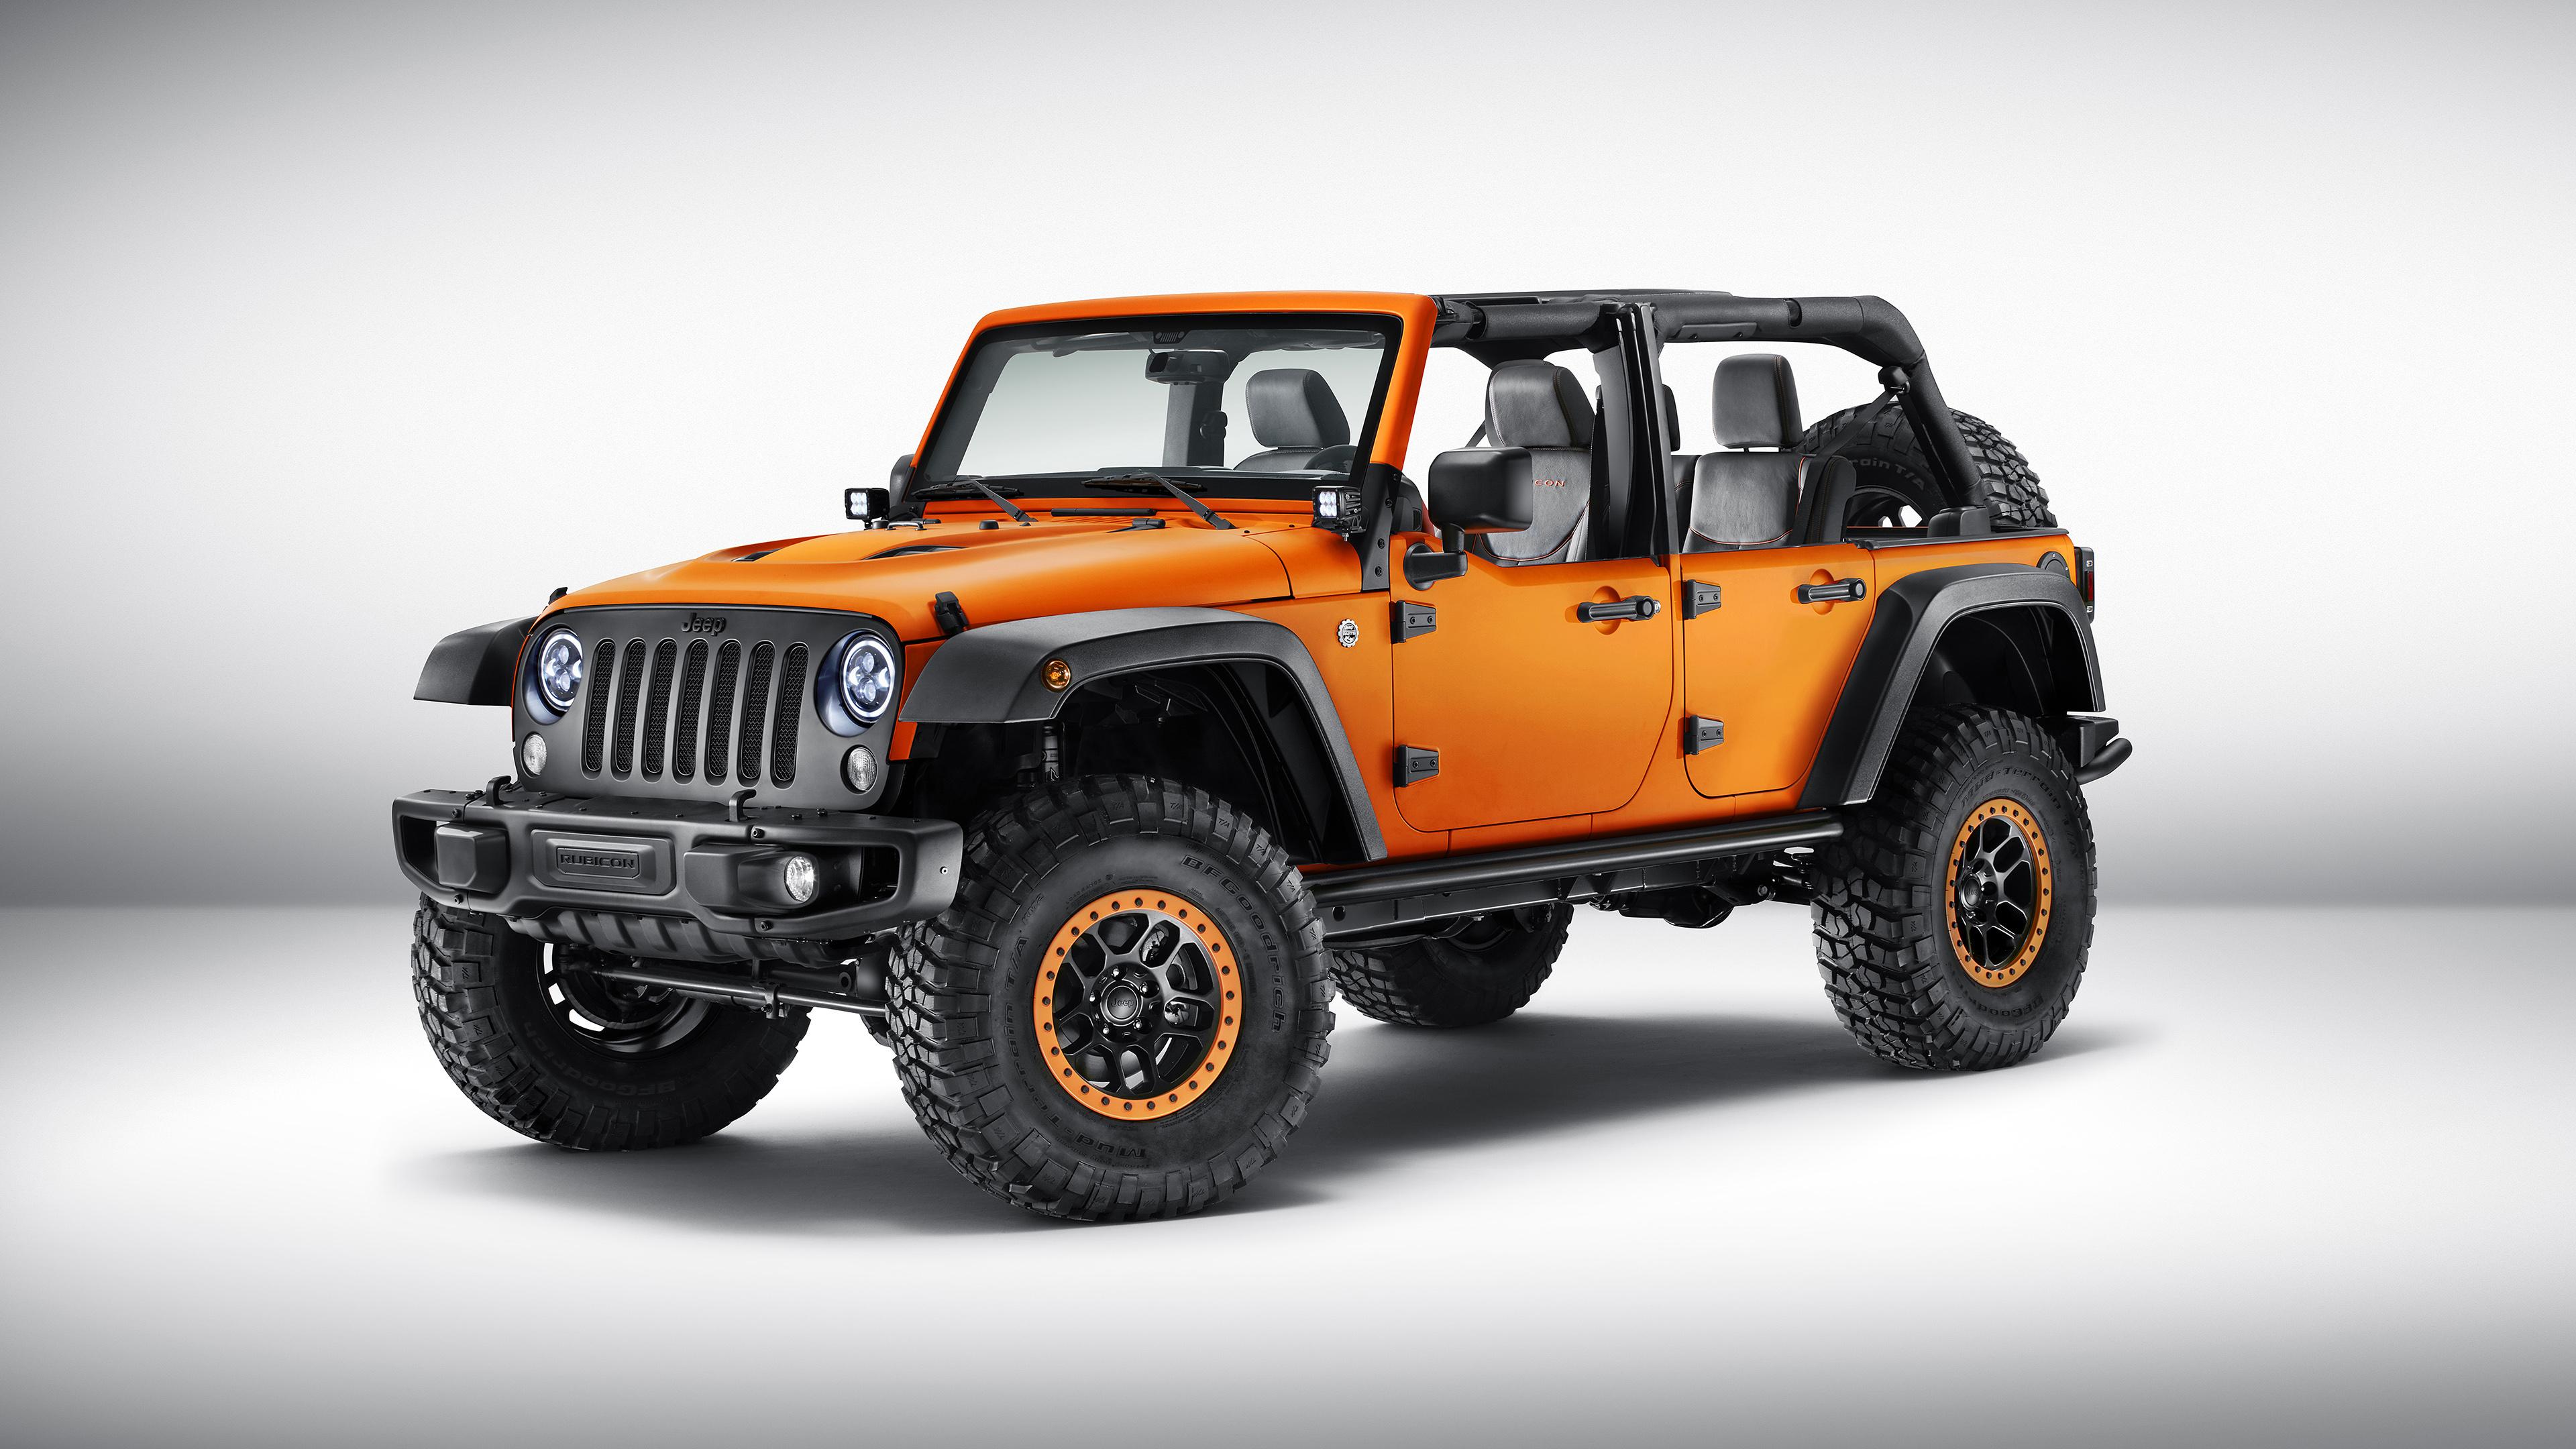 2015 jeep wrangler concept wallpaper hd car wallpapers. Black Bedroom Furniture Sets. Home Design Ideas